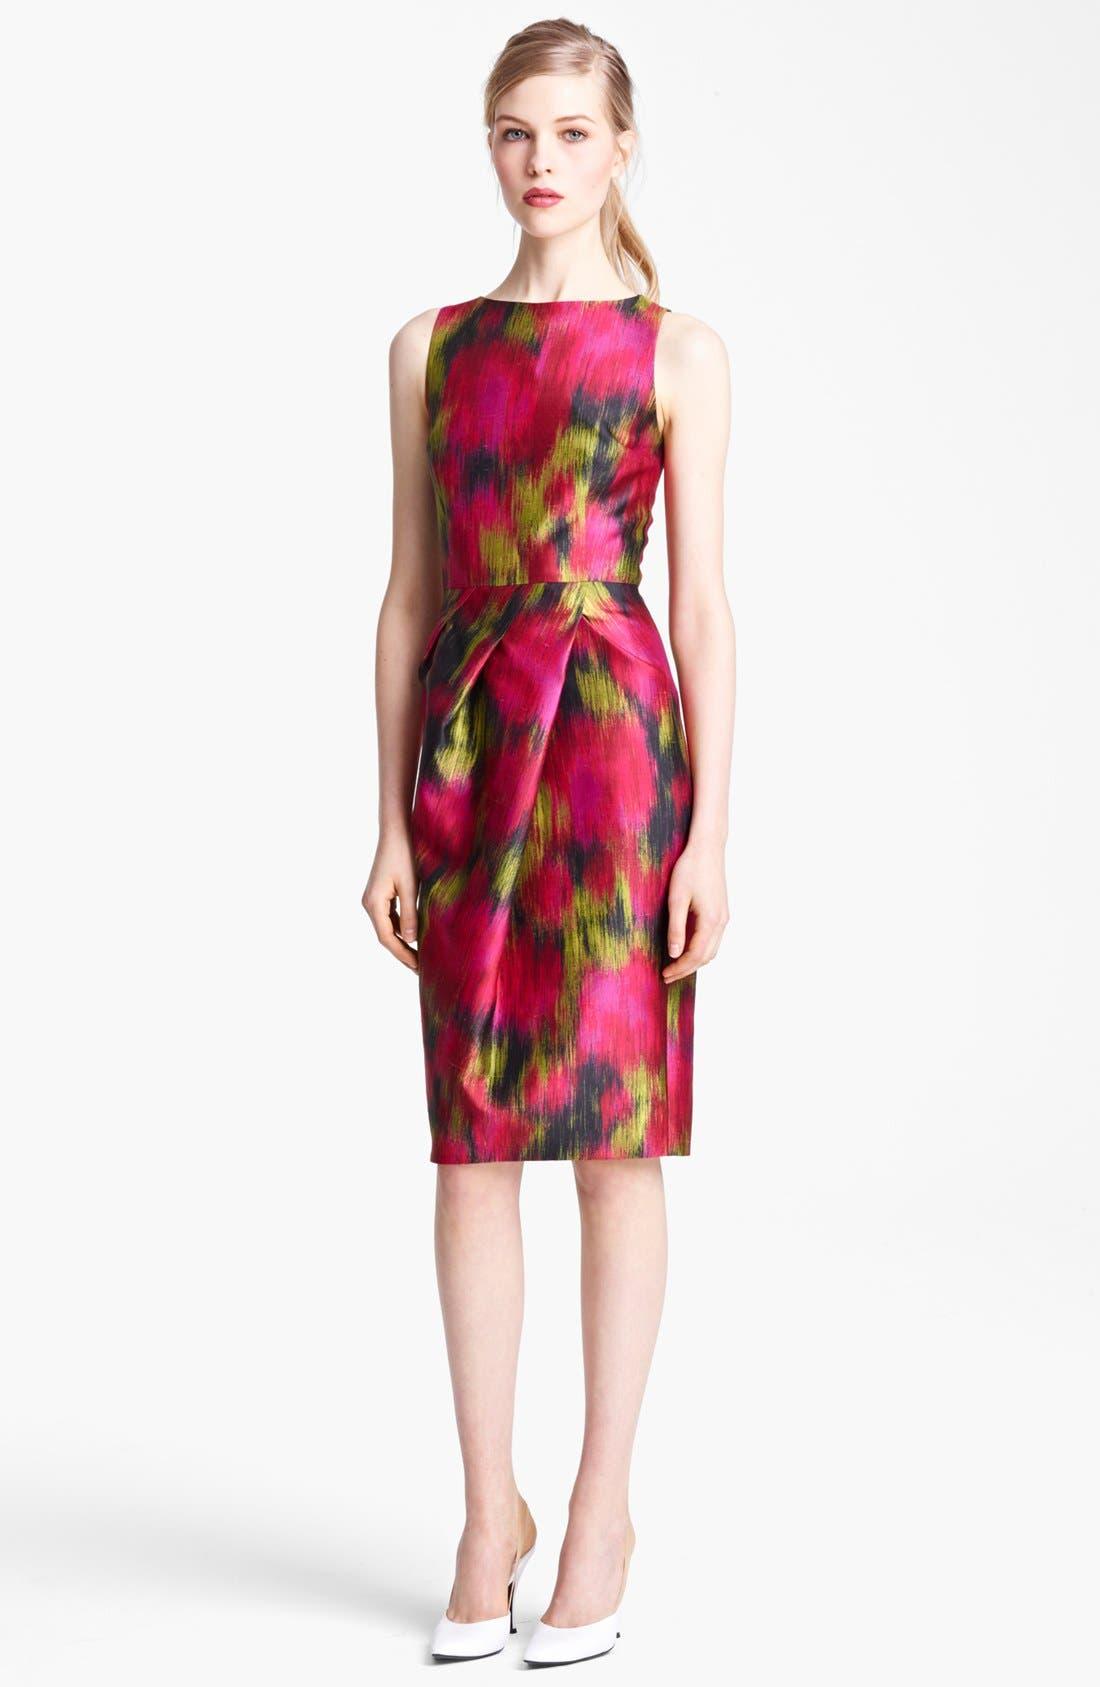 Alternate Image 1 Selected - Michael Kors Zinnia Print Shantung Dress